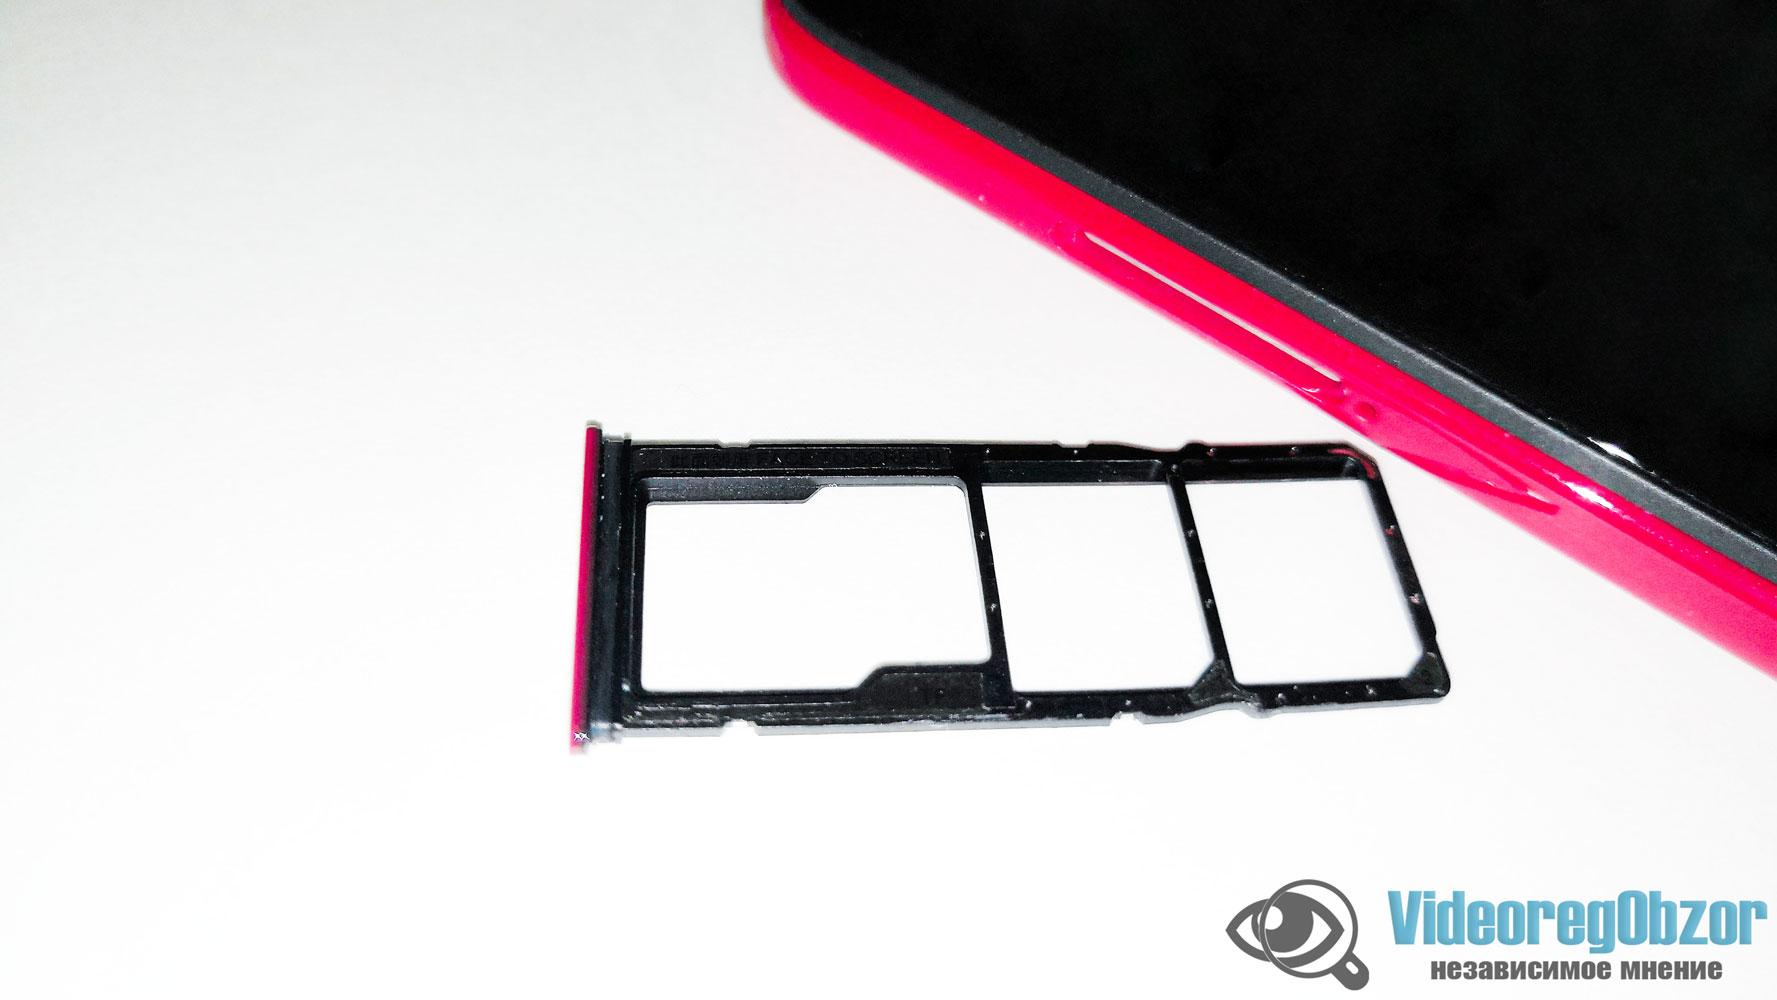 Xiomi Redmi 8 лоток VideoregObzor Обзор смартфона Xiaomi Redmi 8 4/64GB